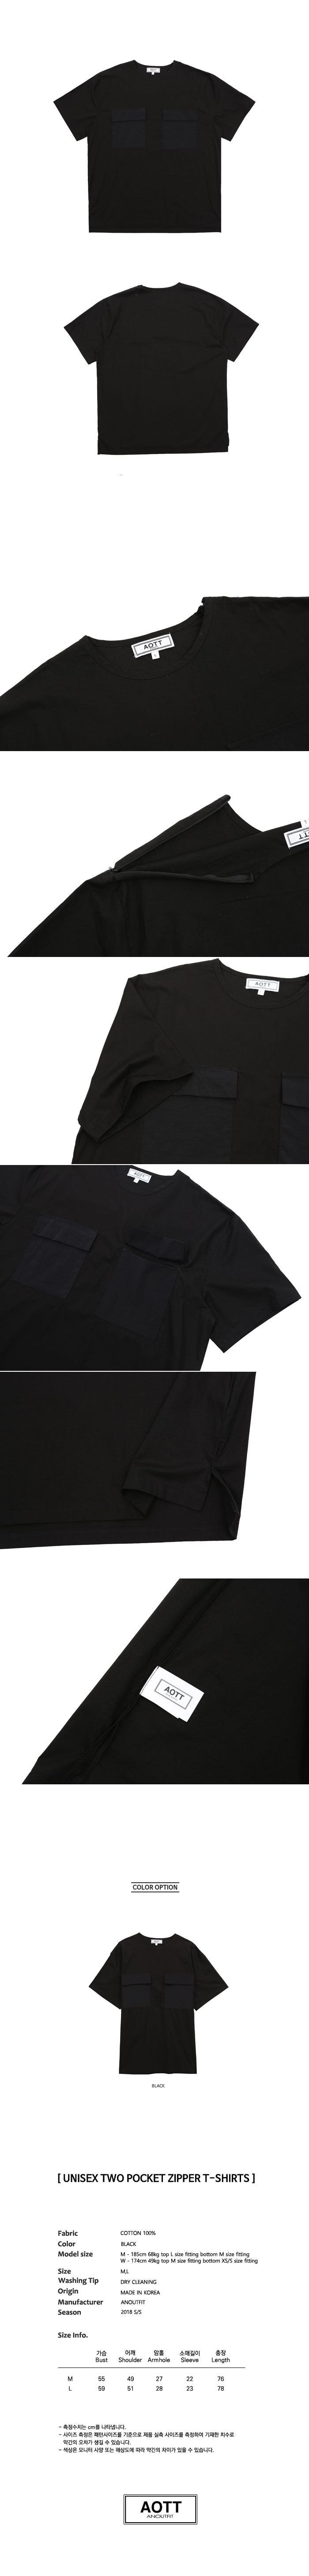 BLACK_03.jpg